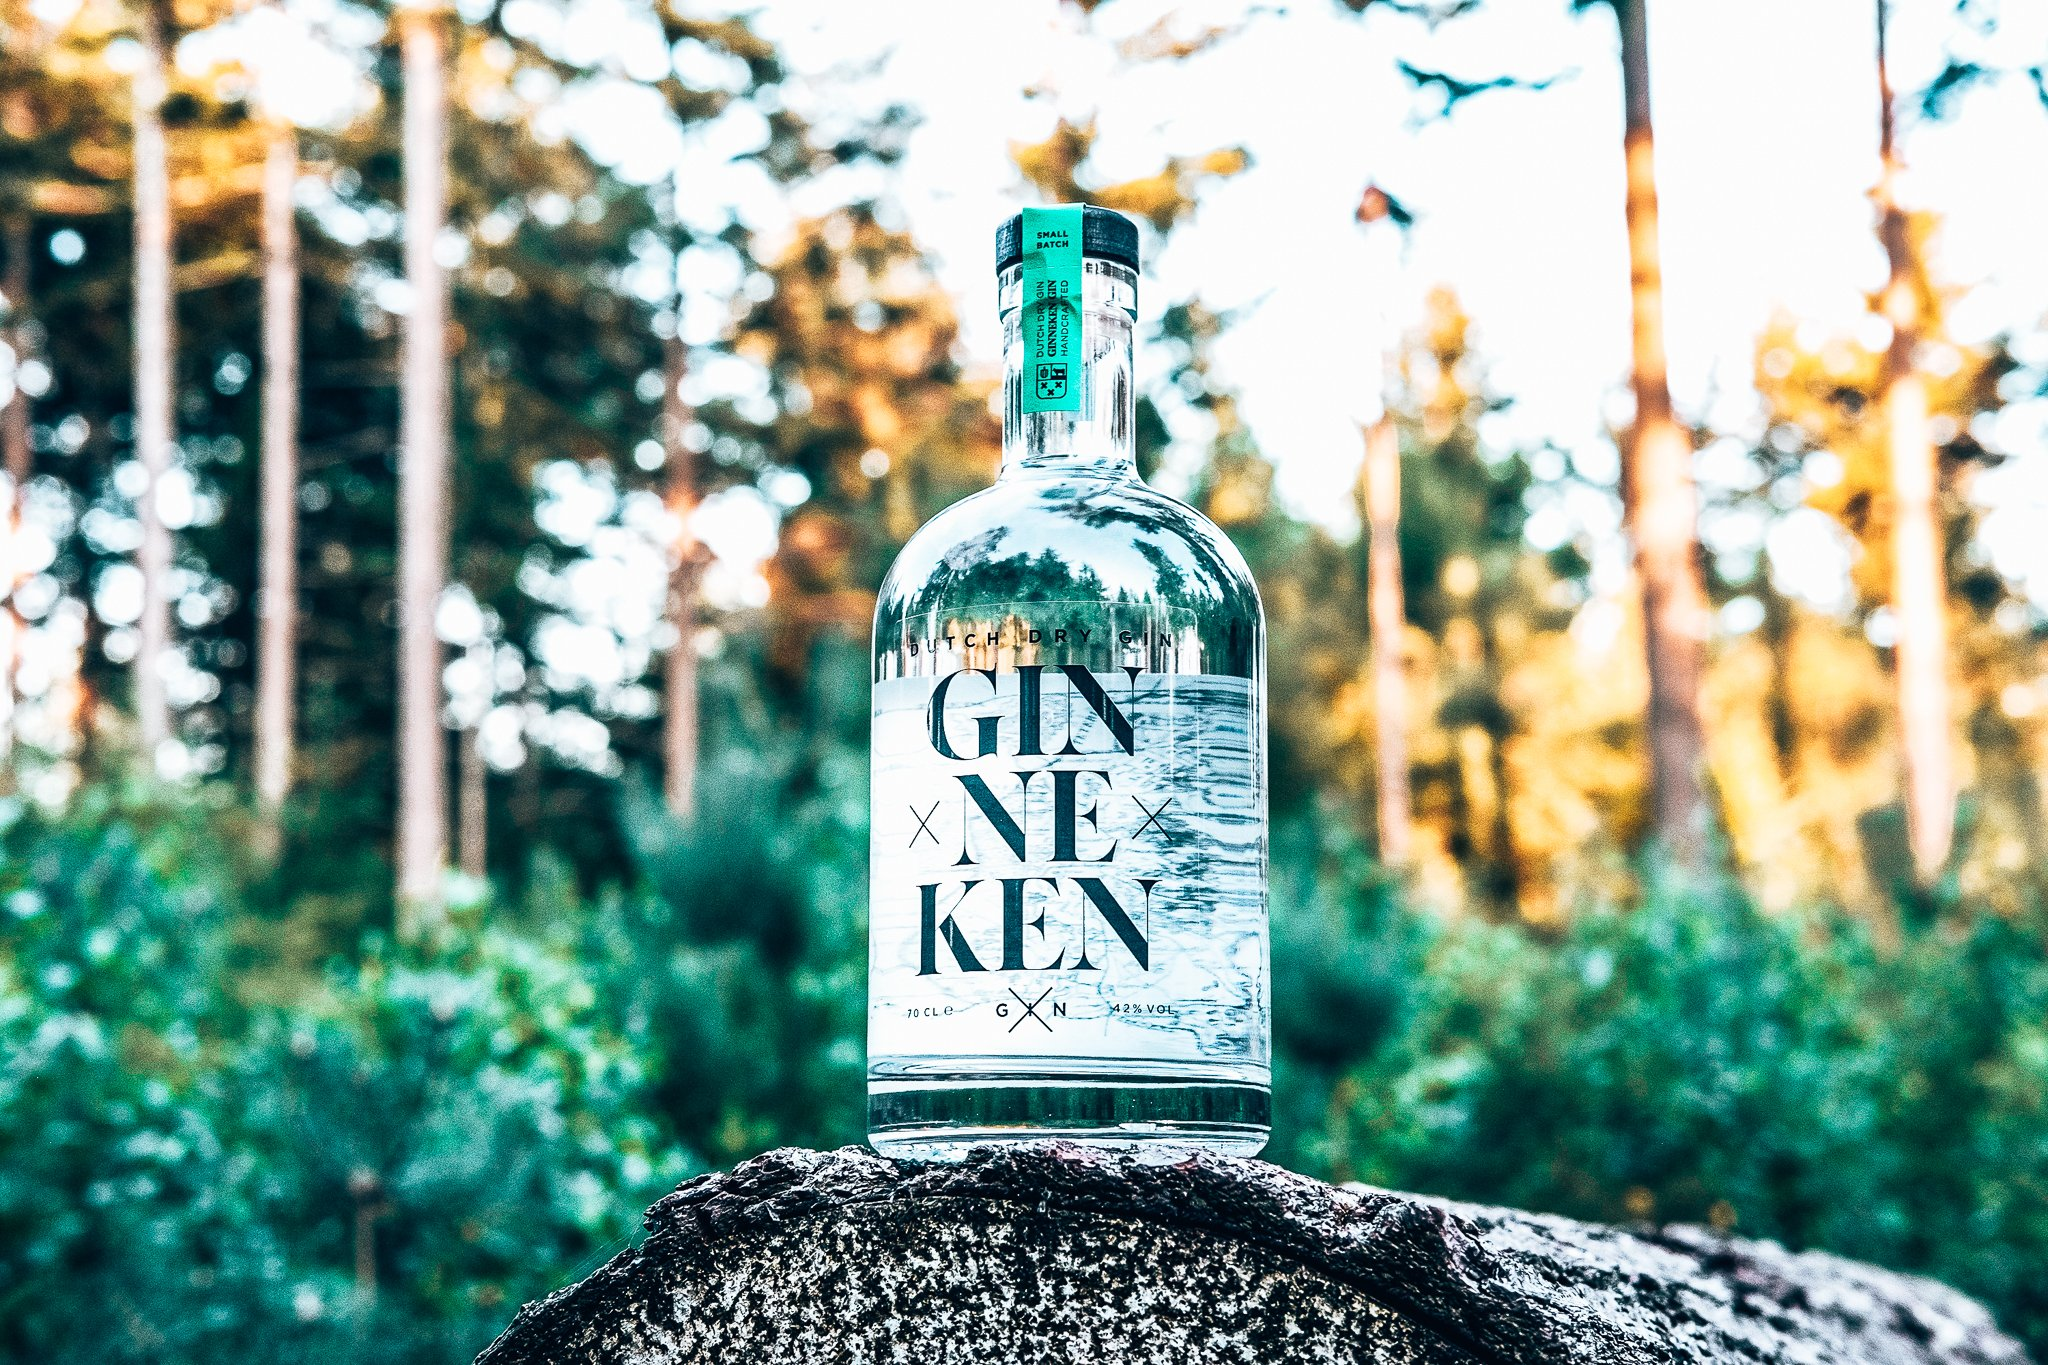 Ginneken Gin in het Mastbos, Alles over gin.